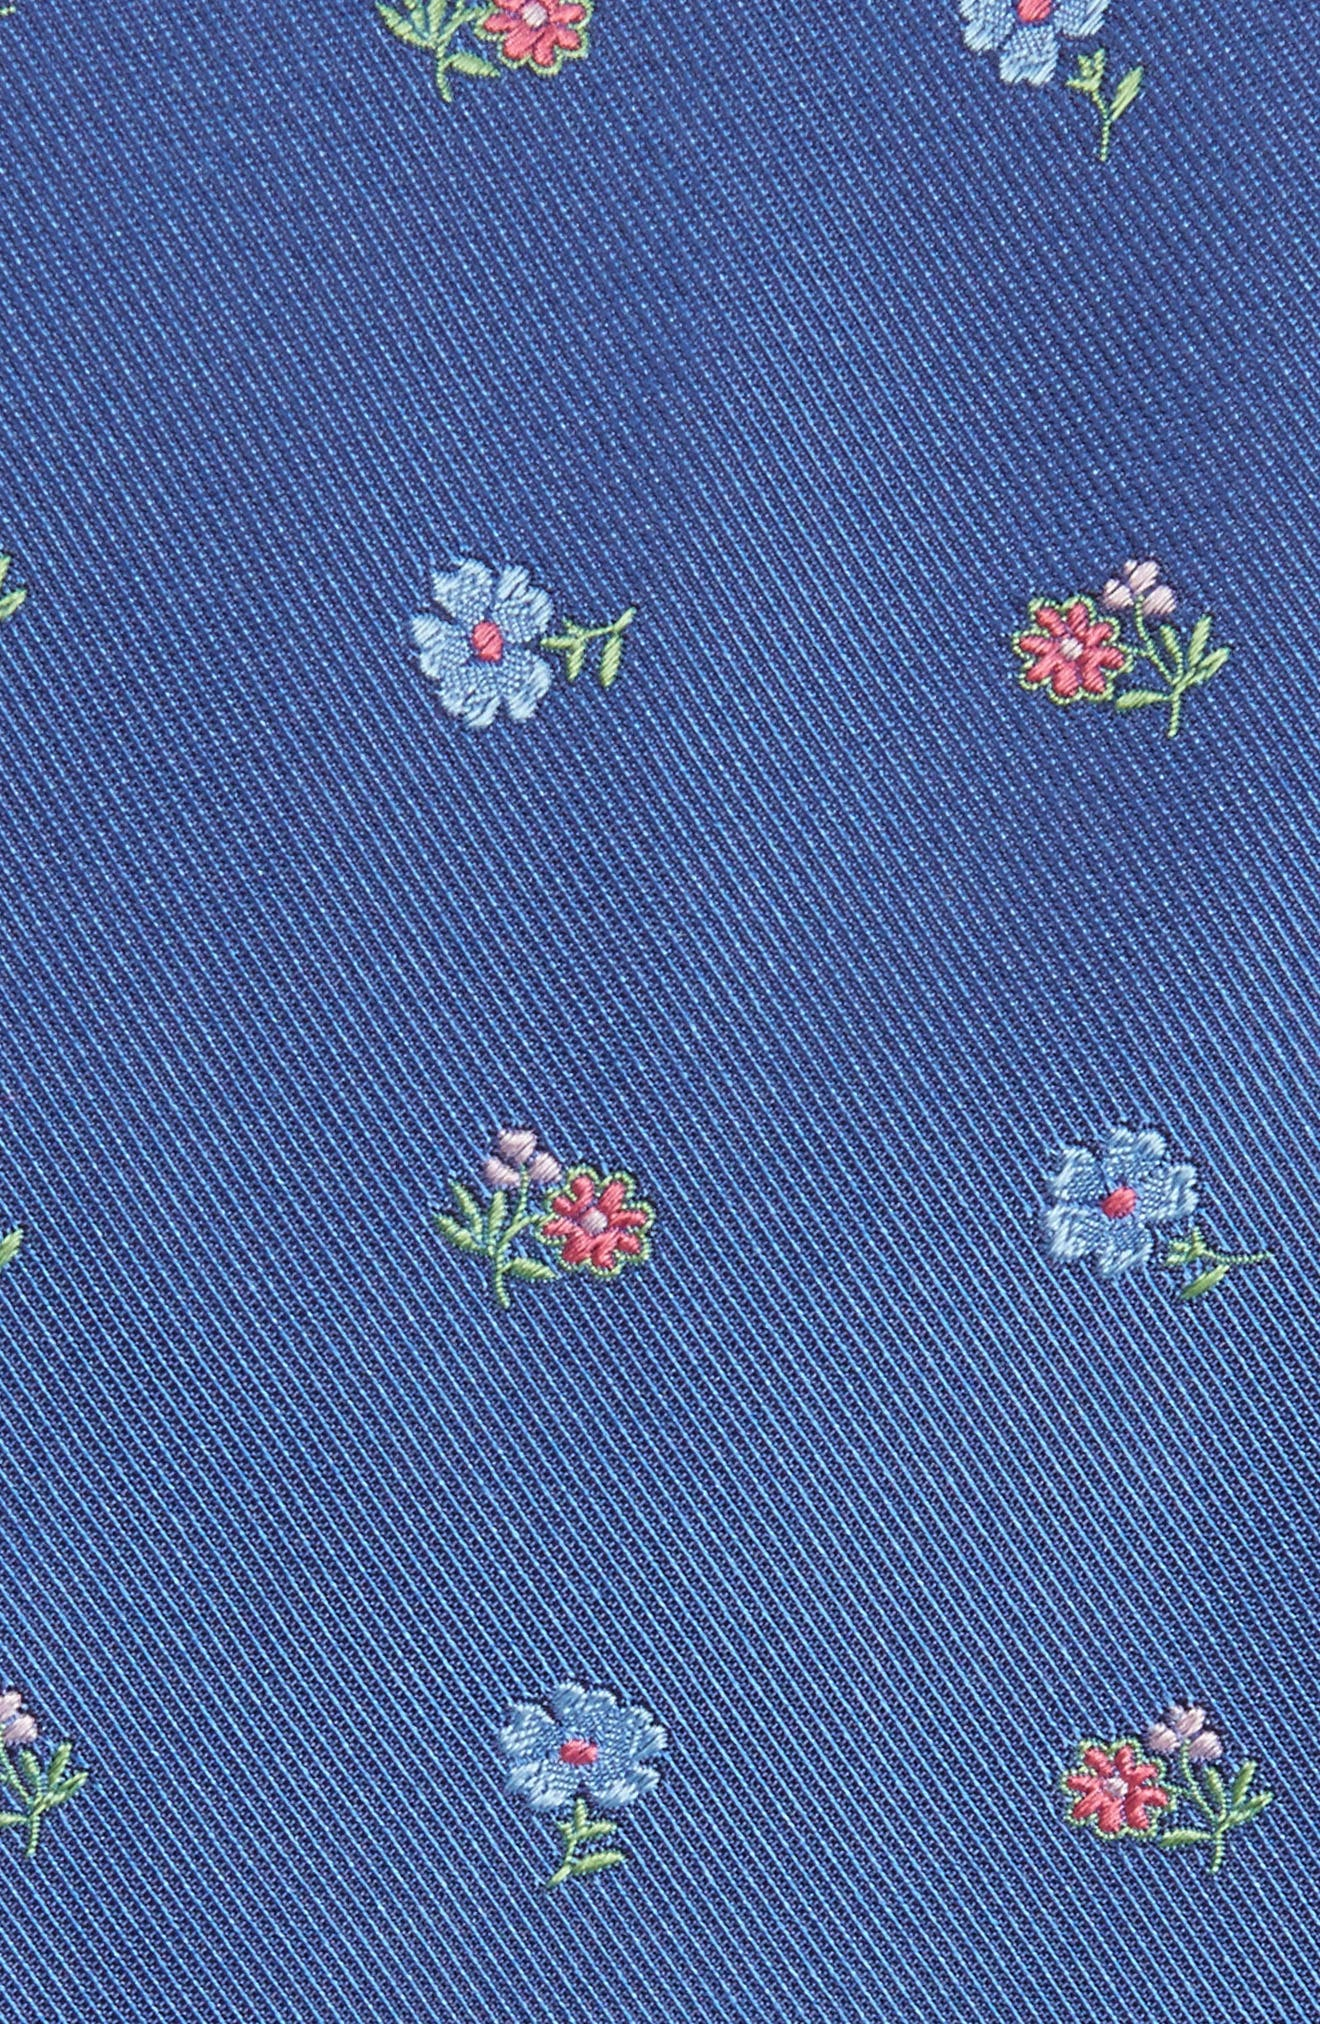 Alternate Image 2  - Canali Floral Jacquard Silk Tie